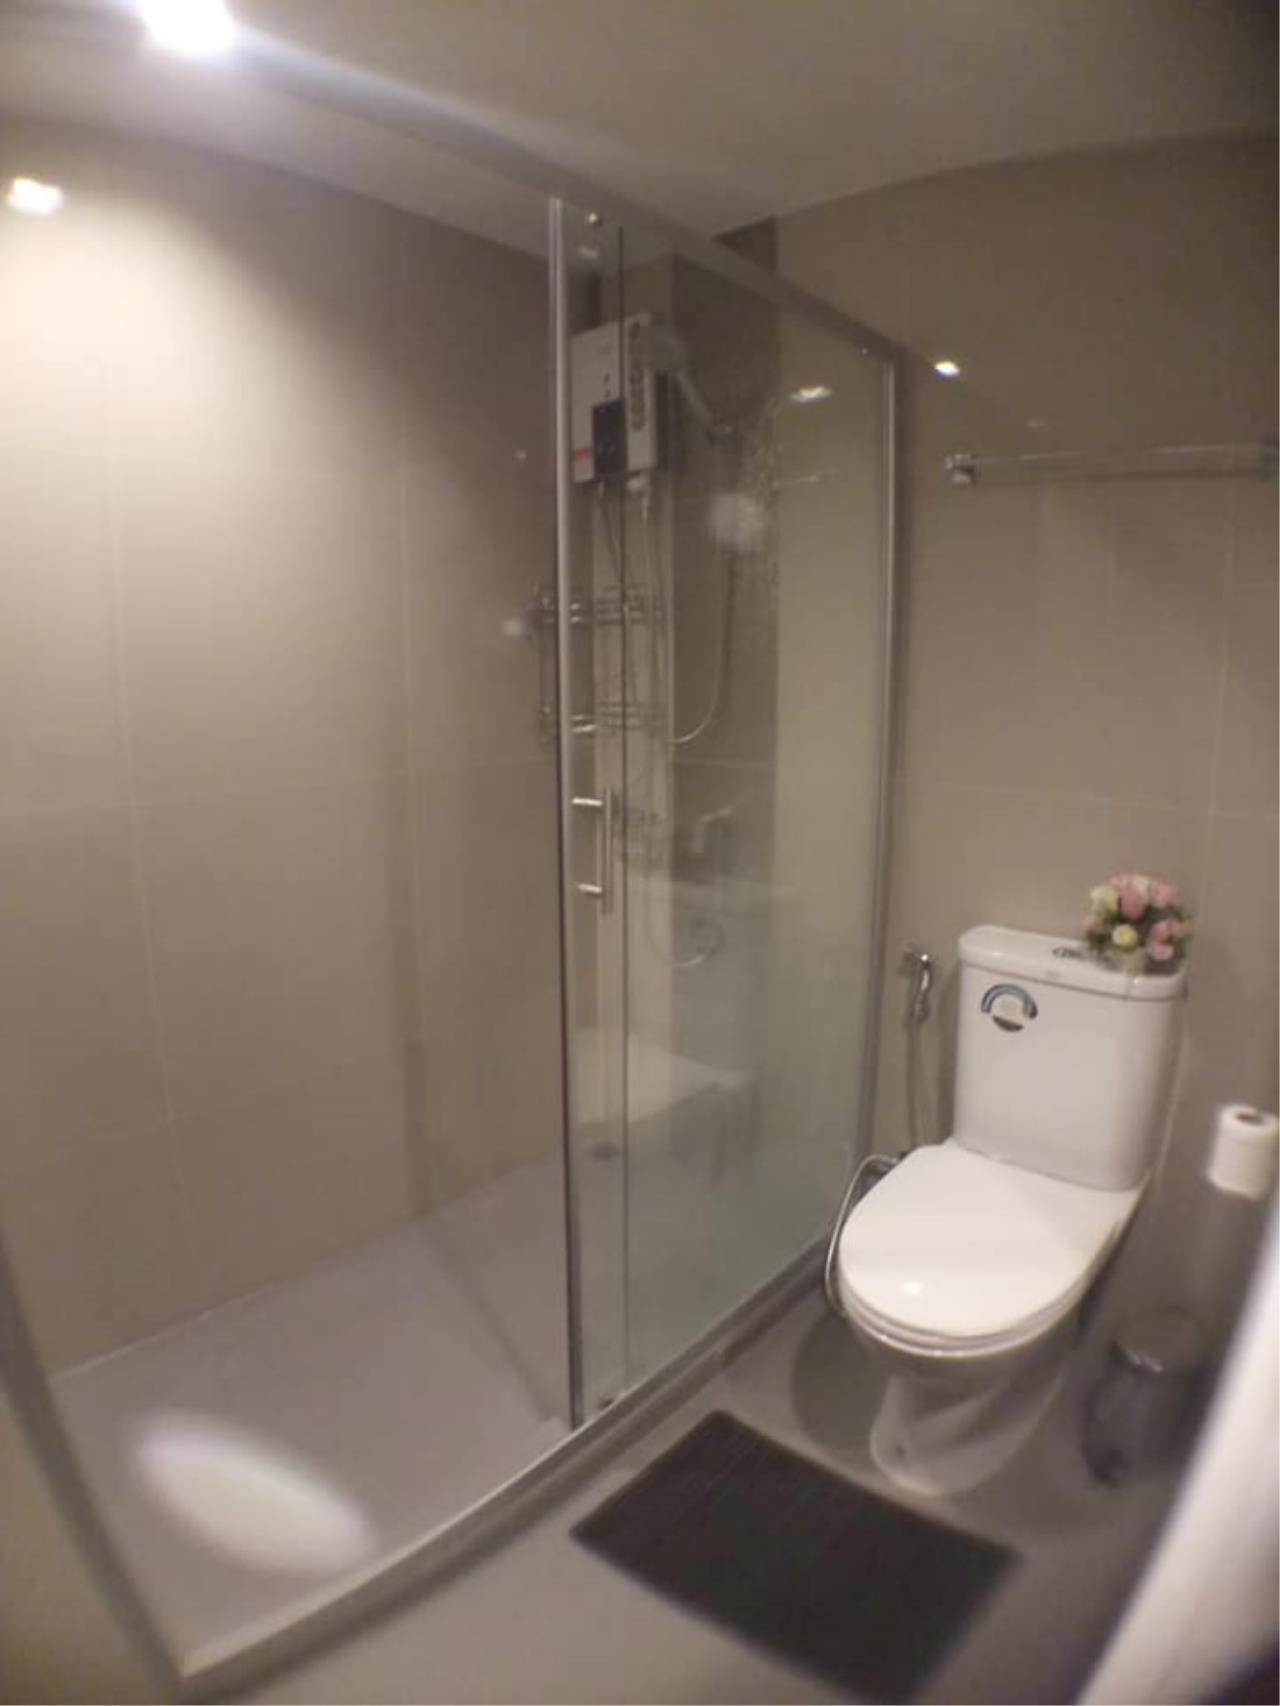 Century21 Skylux Agency's Ideo Sukhumvit 93 / Condo For Rent / 1 Bedroom / 27 SQM / BTS Bang Chak / Bangkok 10